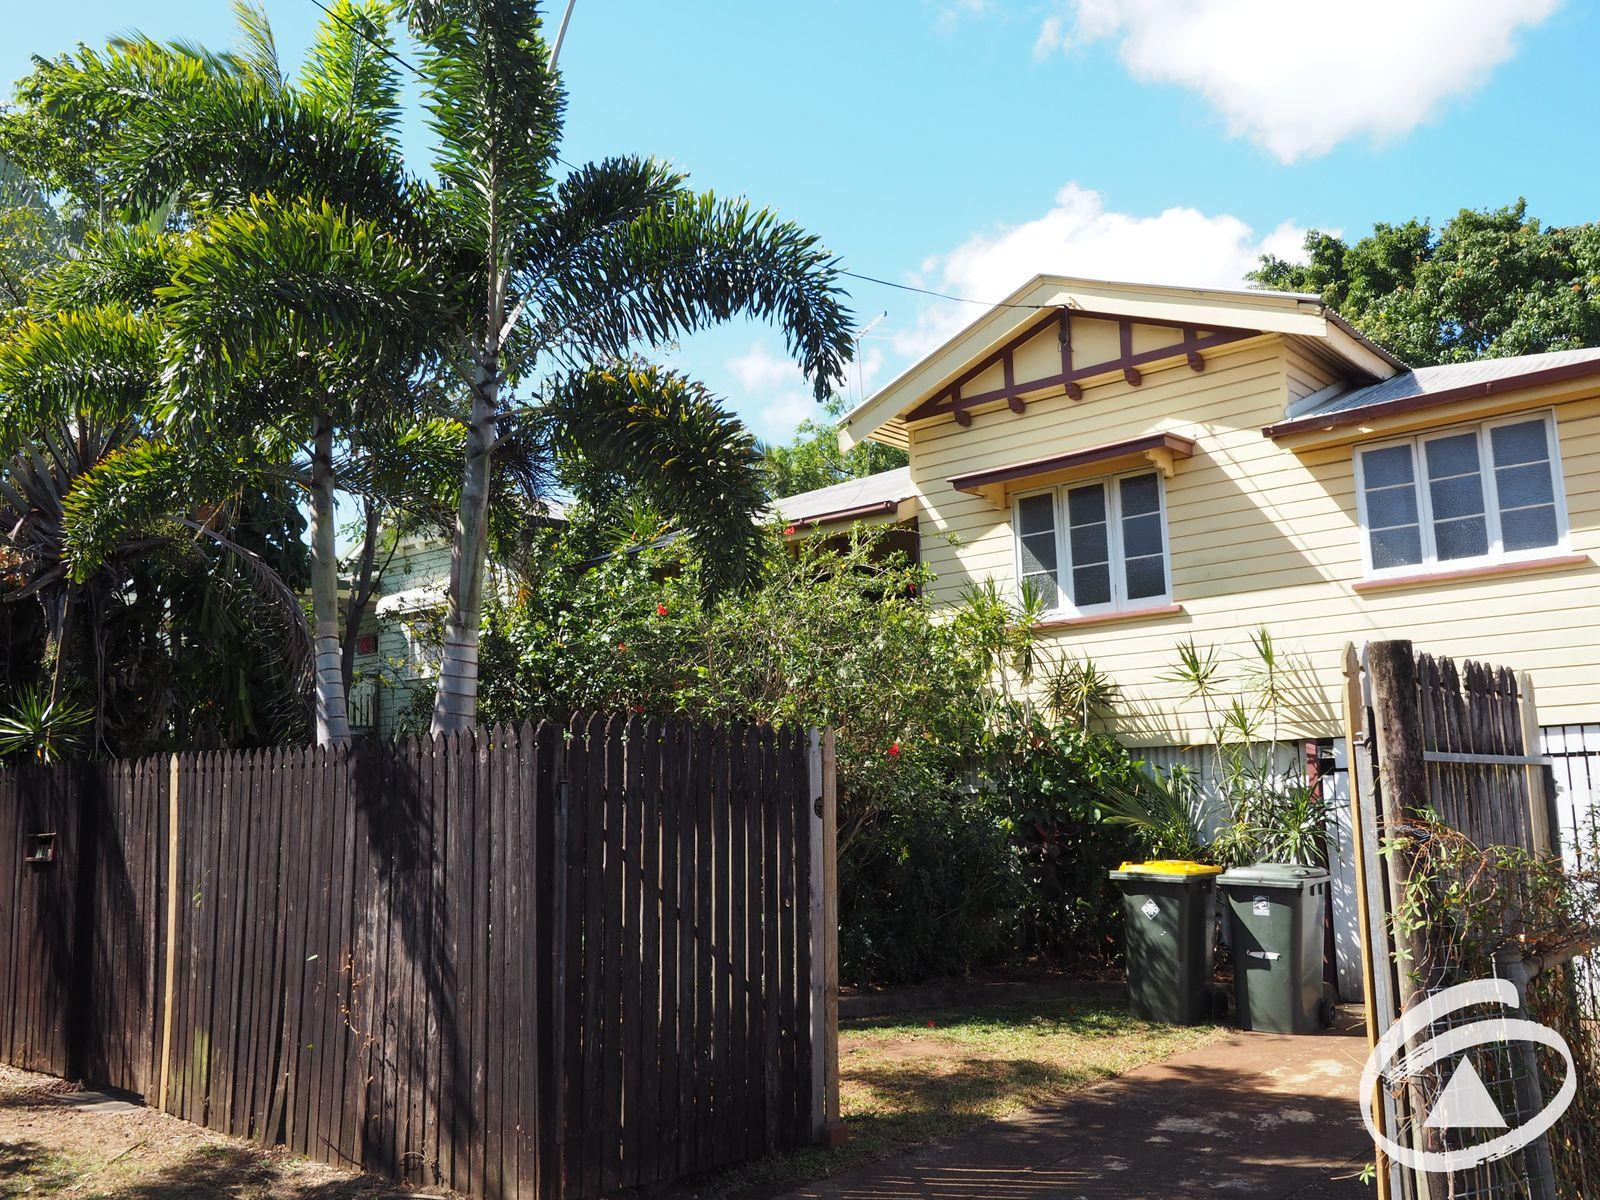 146 Buchan Street, Bungalow, QLD 4870